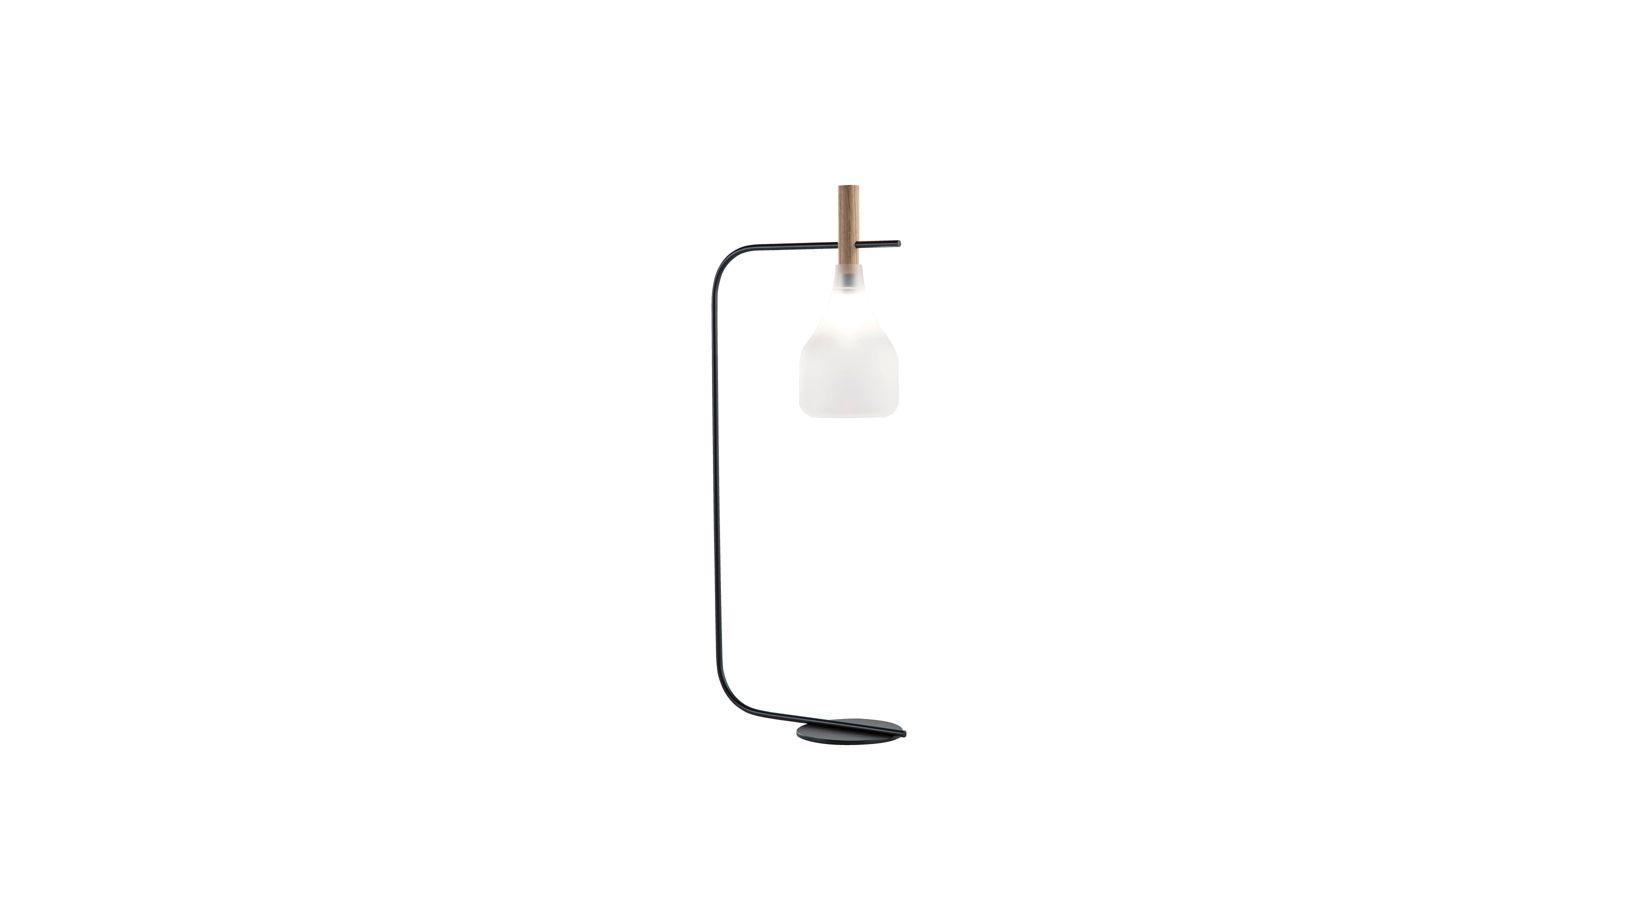 bibliotheque pixl miroir roche bobois. Black Bedroom Furniture Sets. Home Design Ideas